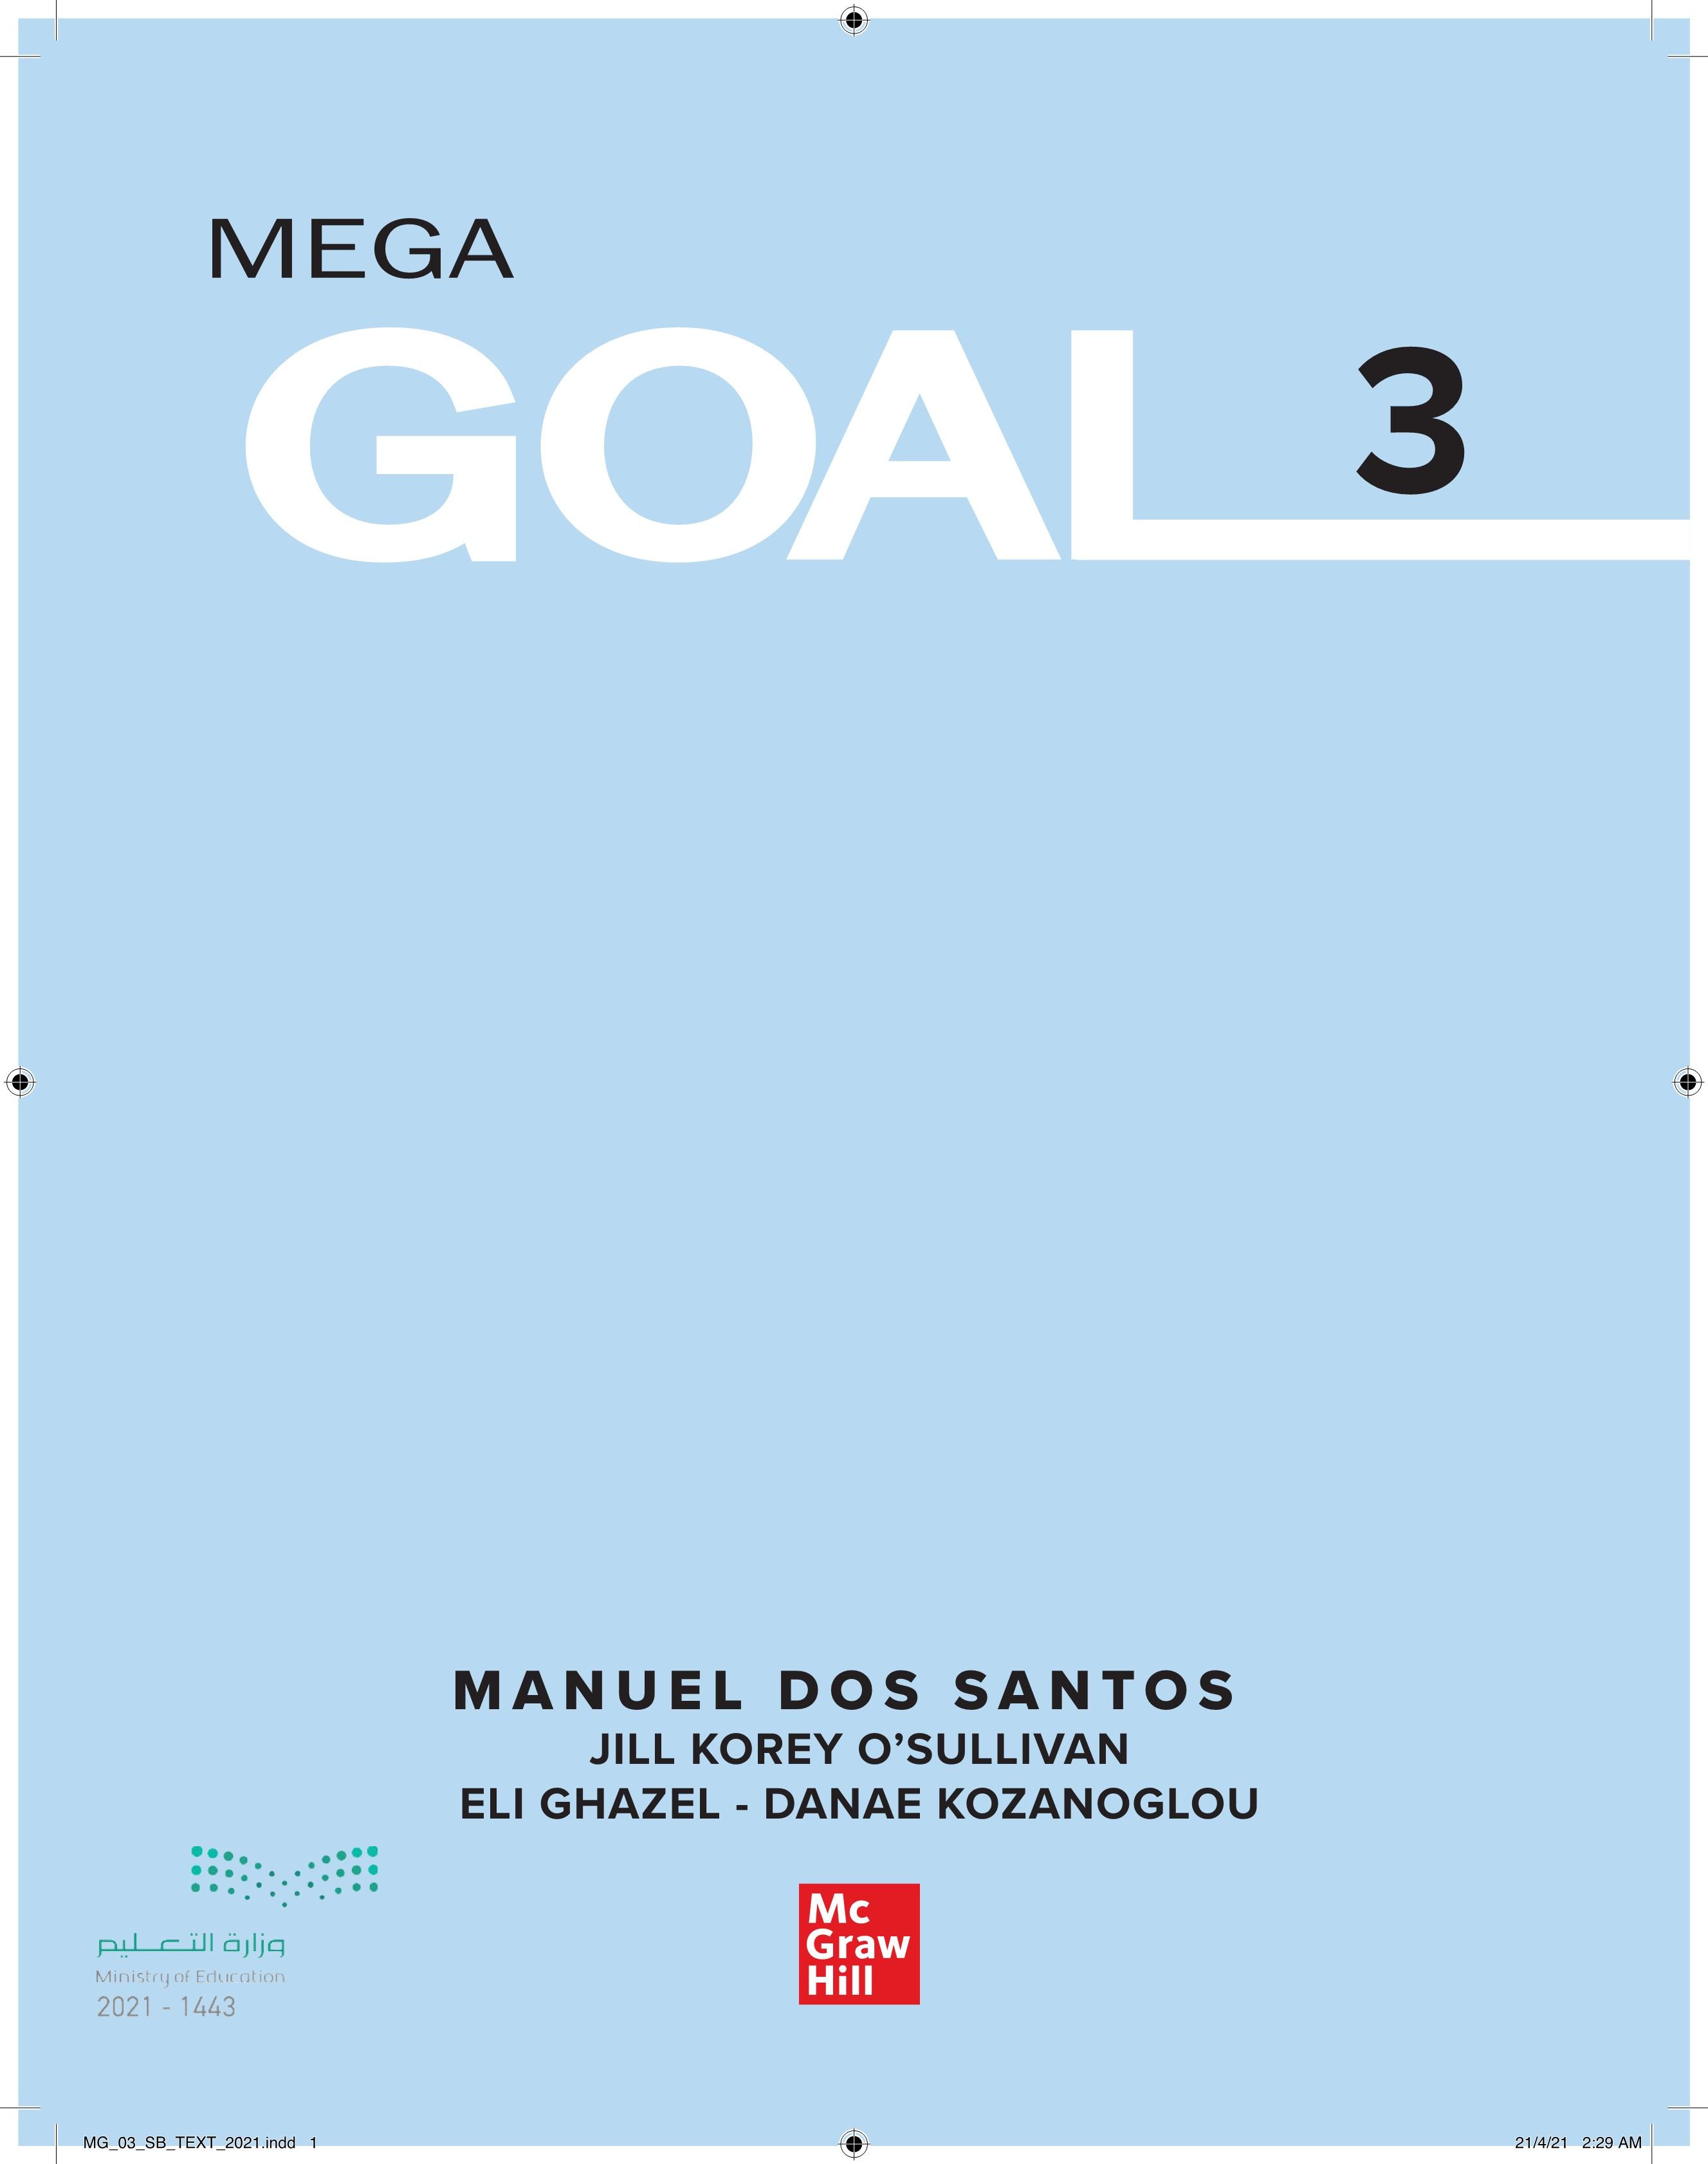 Mega-goal